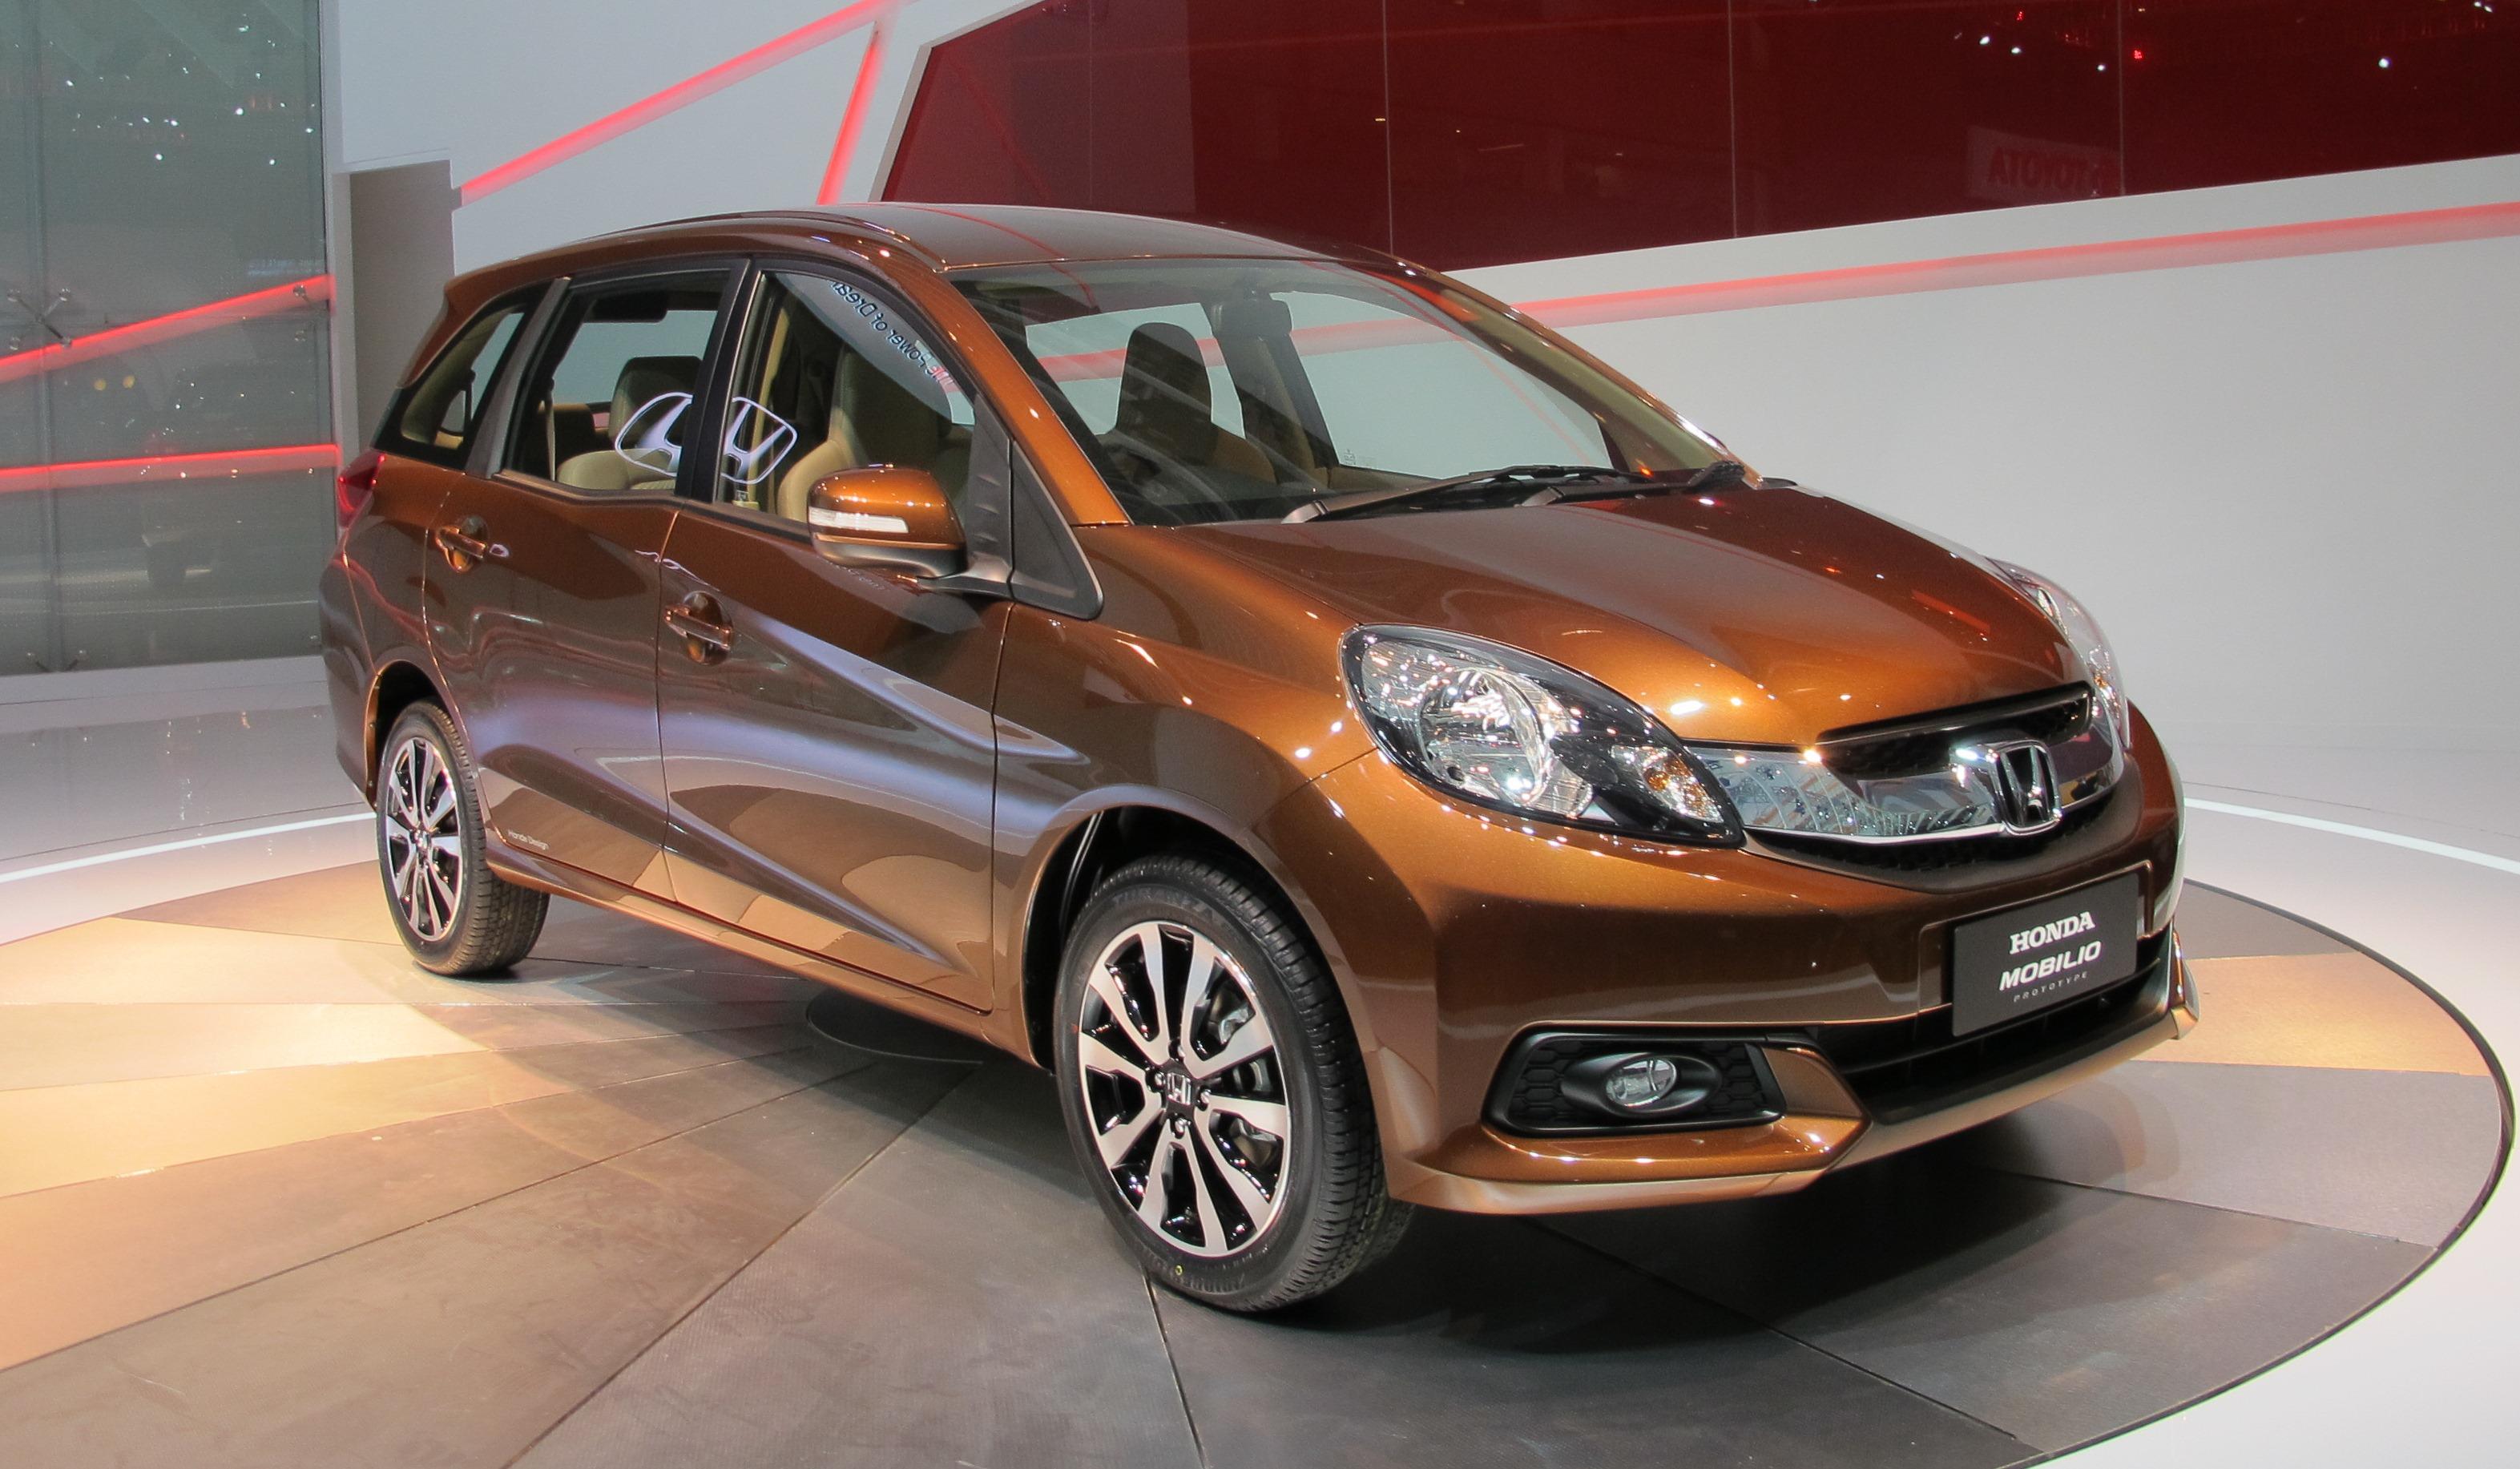 Harga-Honda-Mobilio-159-Jutaan